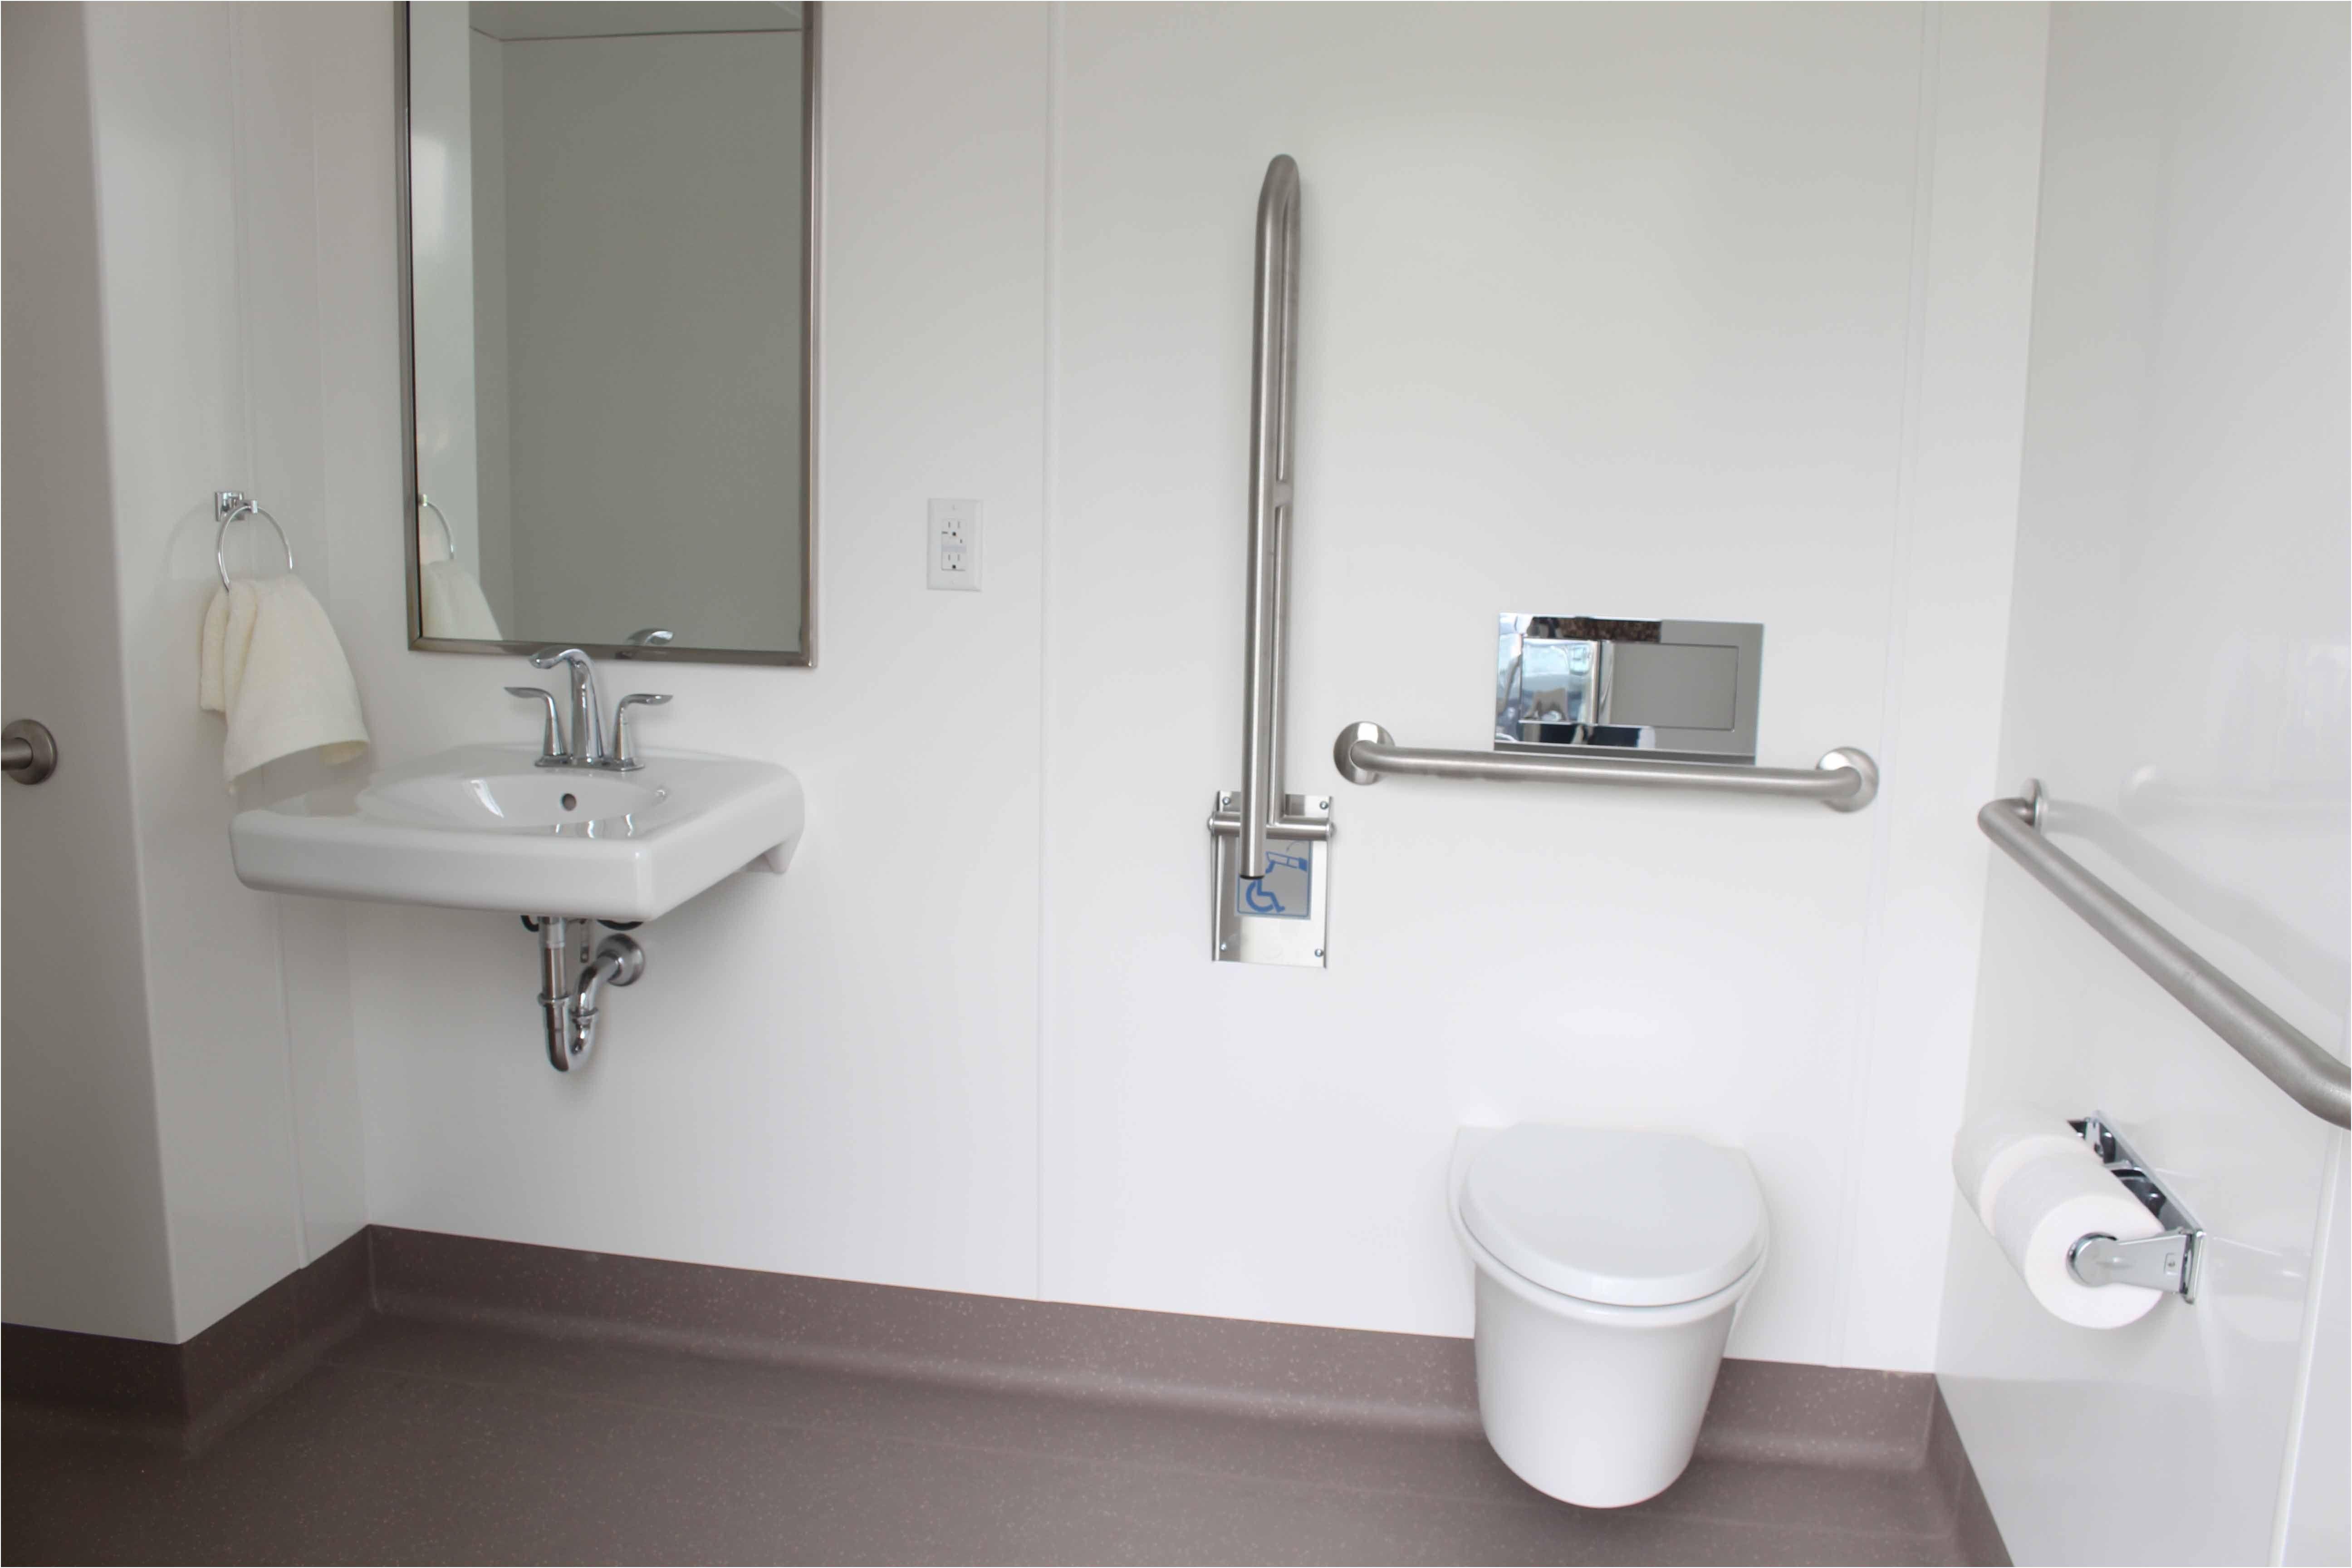 hospital bathroom. hospital bathroom design gurdjieffouspensky from Hospital Bathroom Design